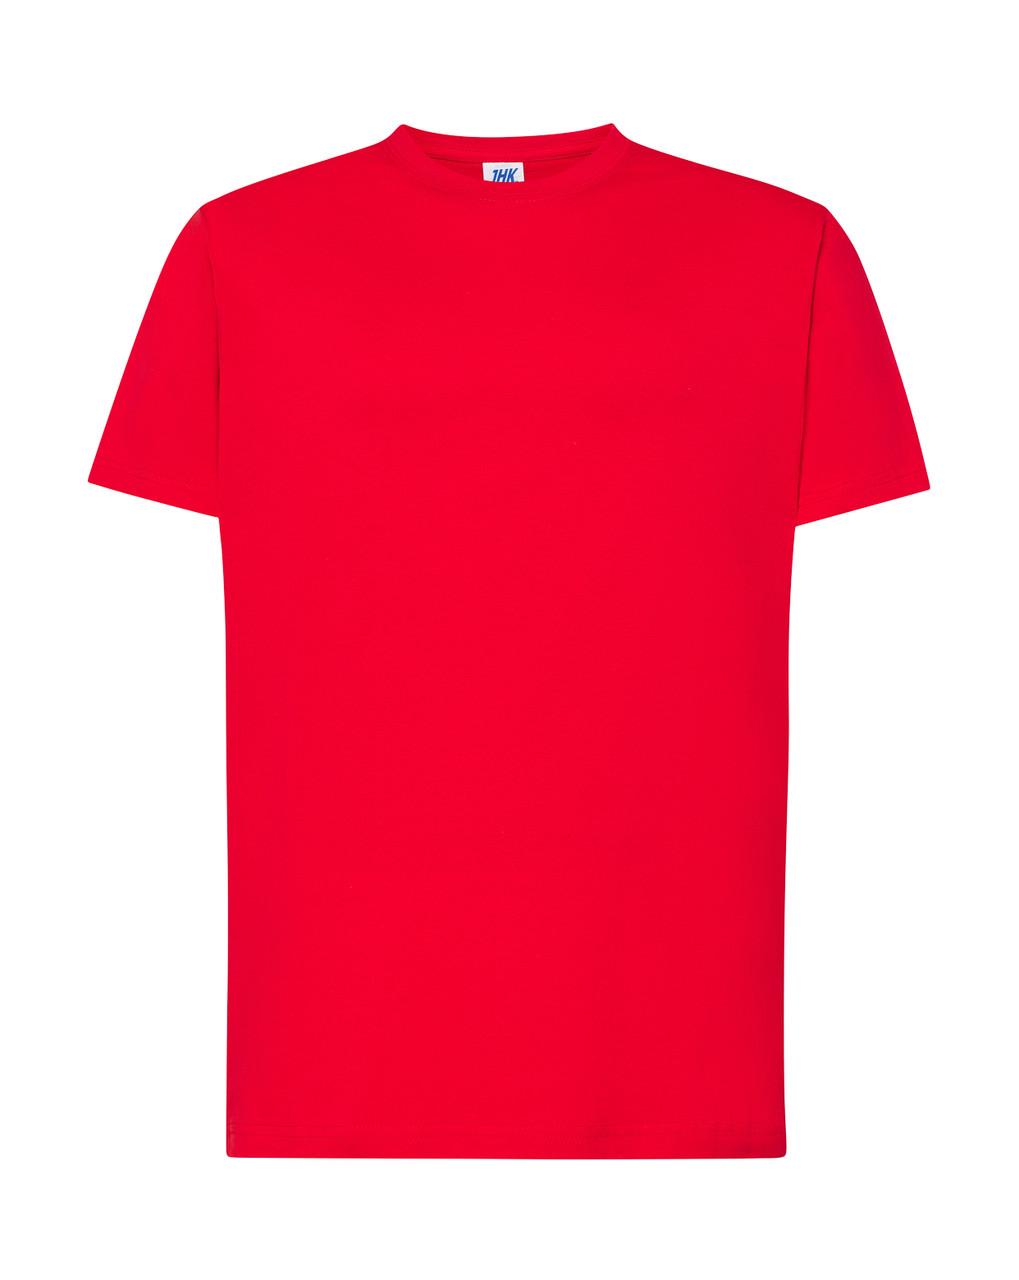 Мужская футболка JHK REGULAR PREMIUM T-SHIRT цвет красный (RD)